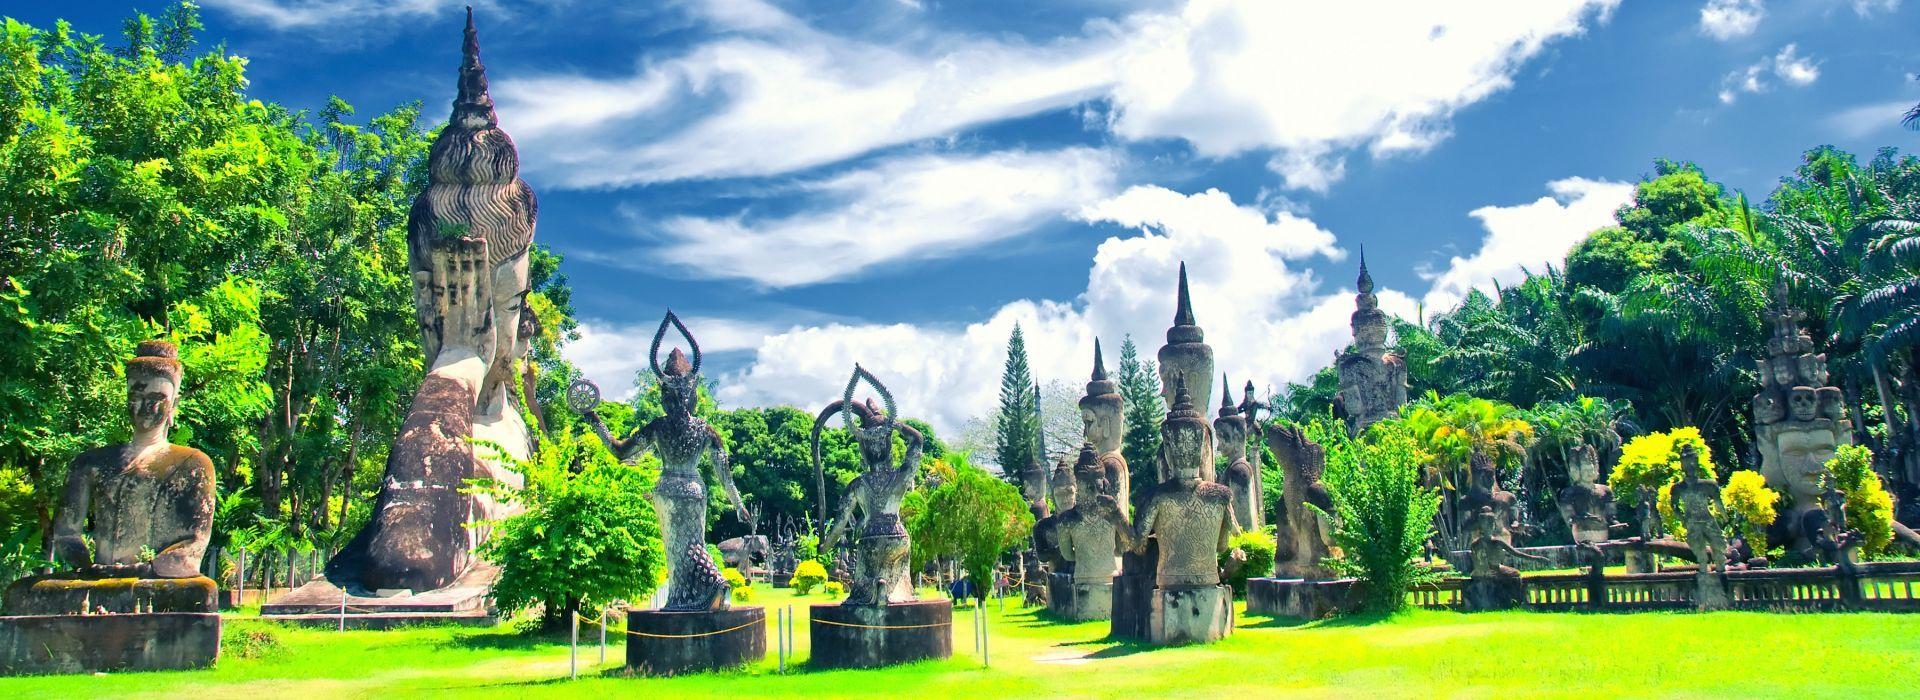 Natural landmarks sightseeing Tours in Vientiane